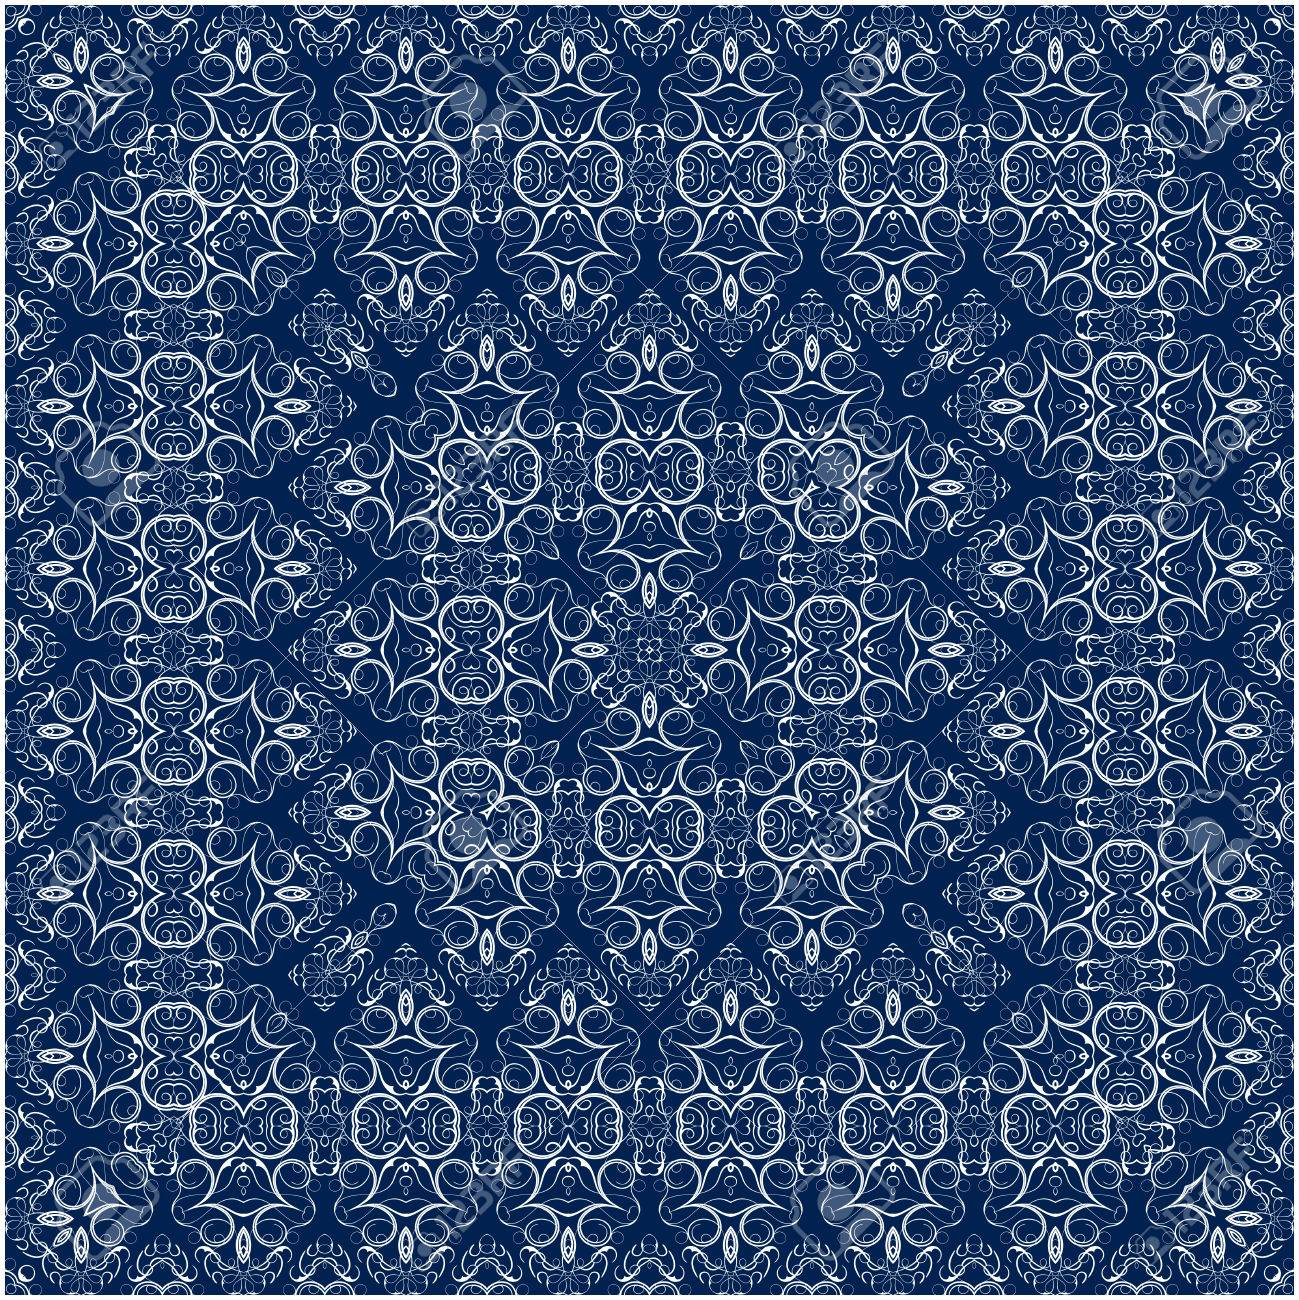 Square White Pattern On A Blue Background Decorative Ornament 1299x1300